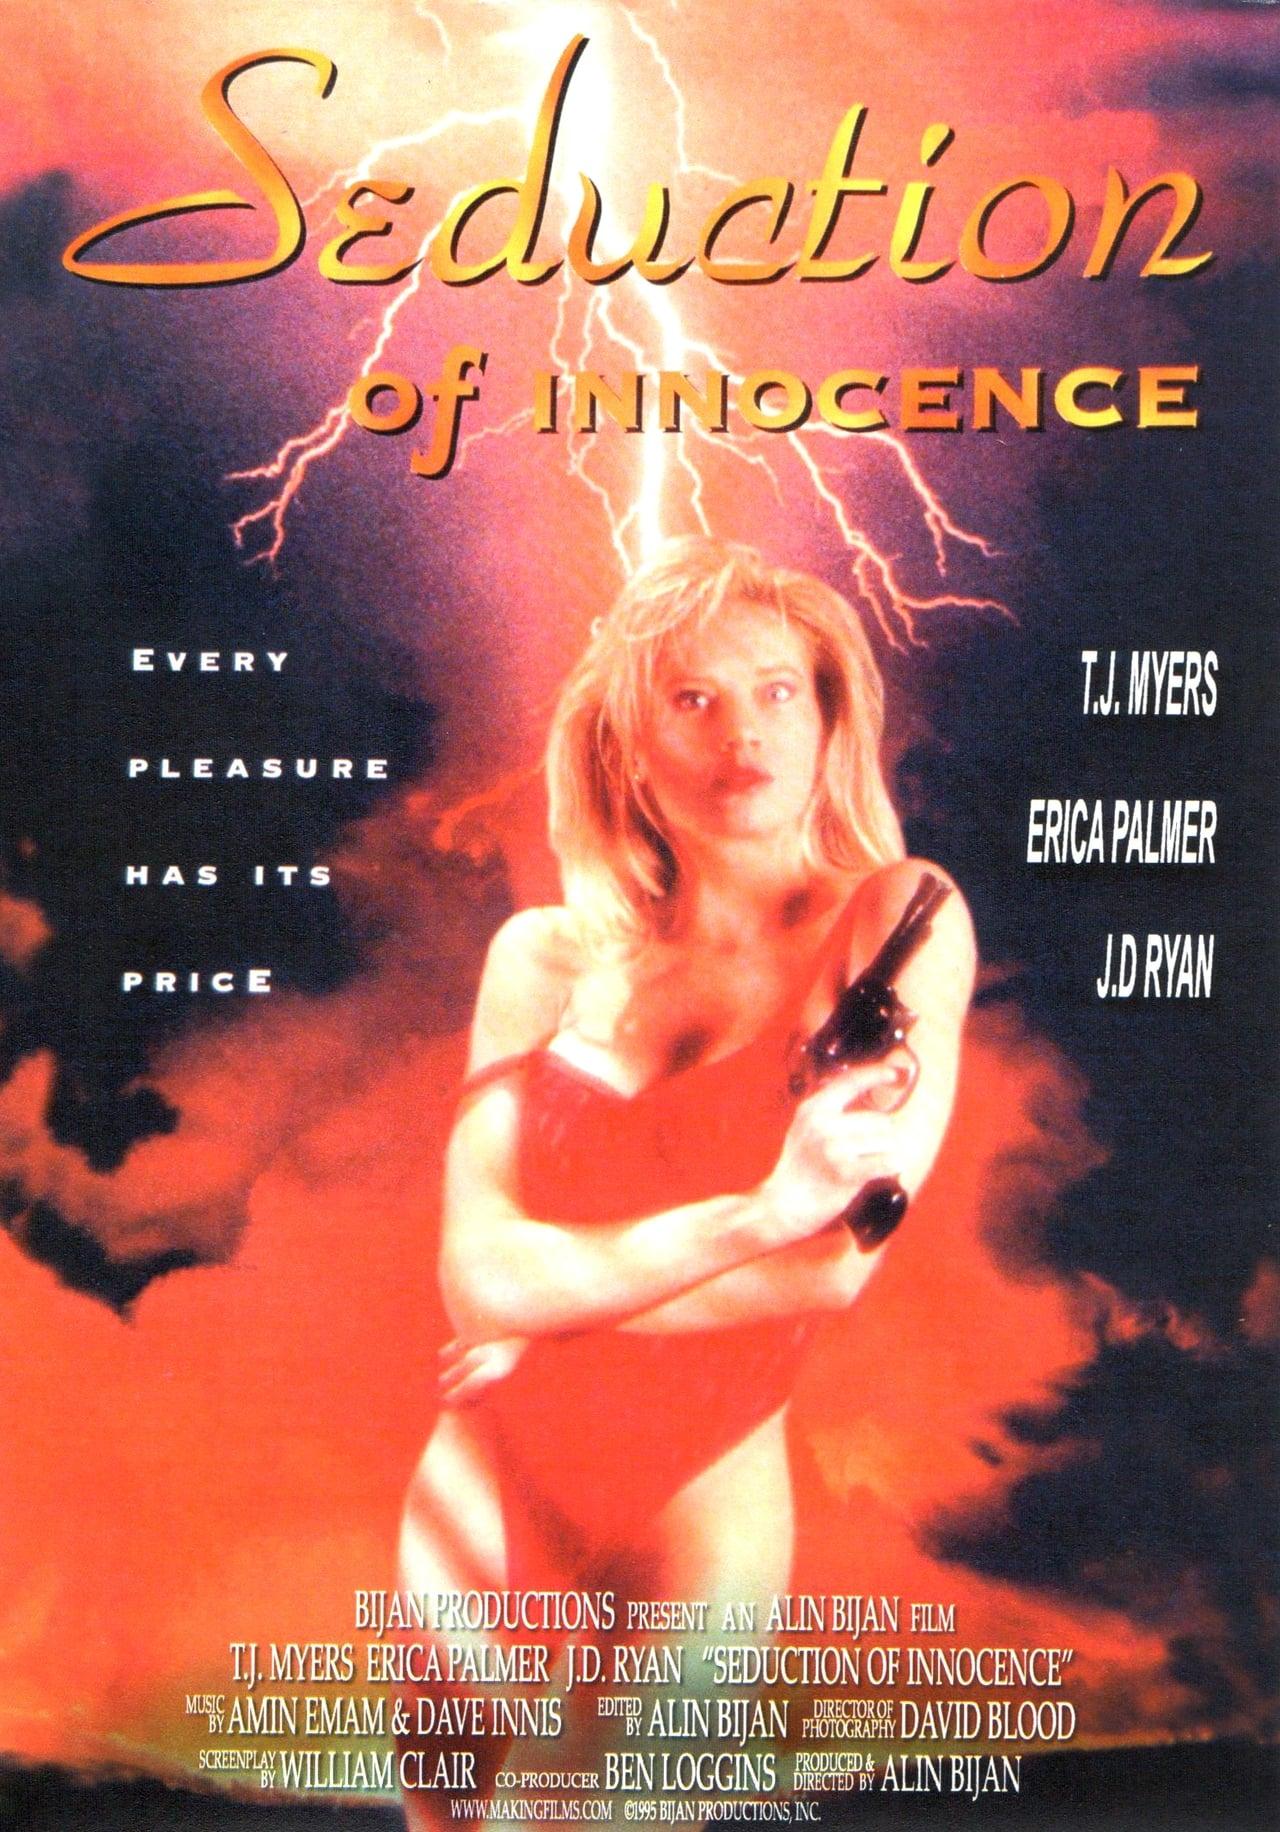 Seduction of Innocence